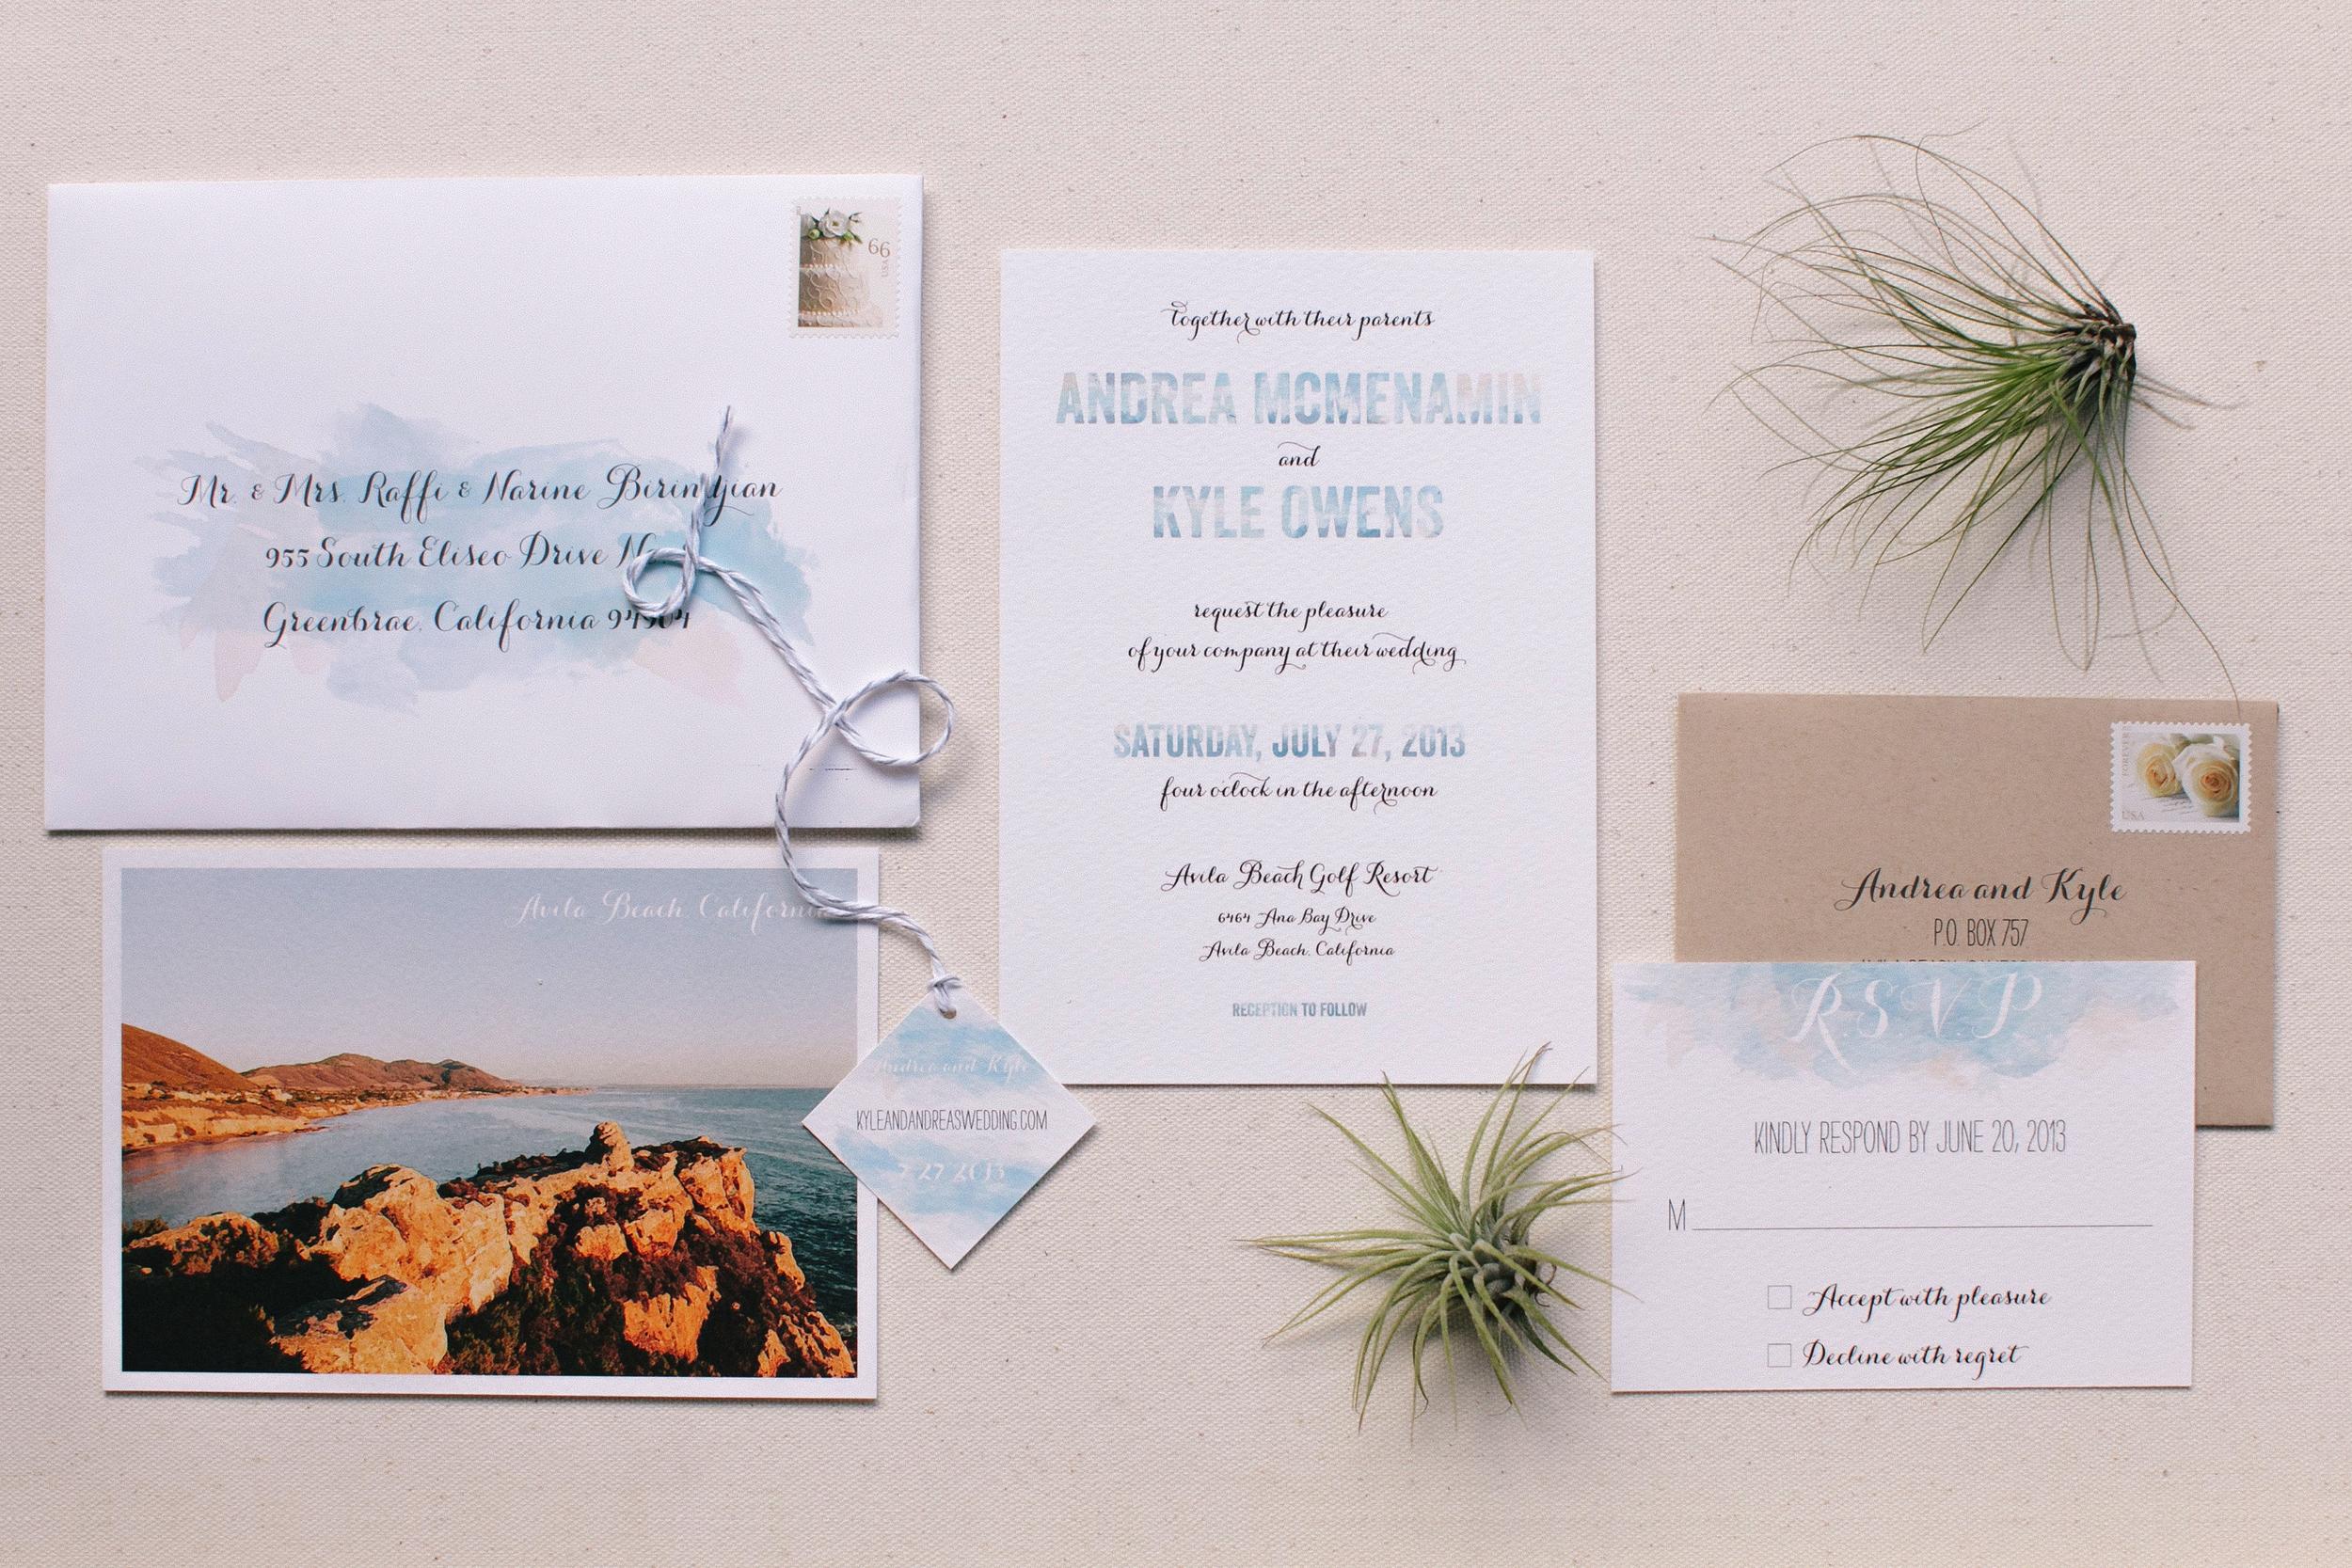 Andrea and Kyle | Avila Beach Wedding